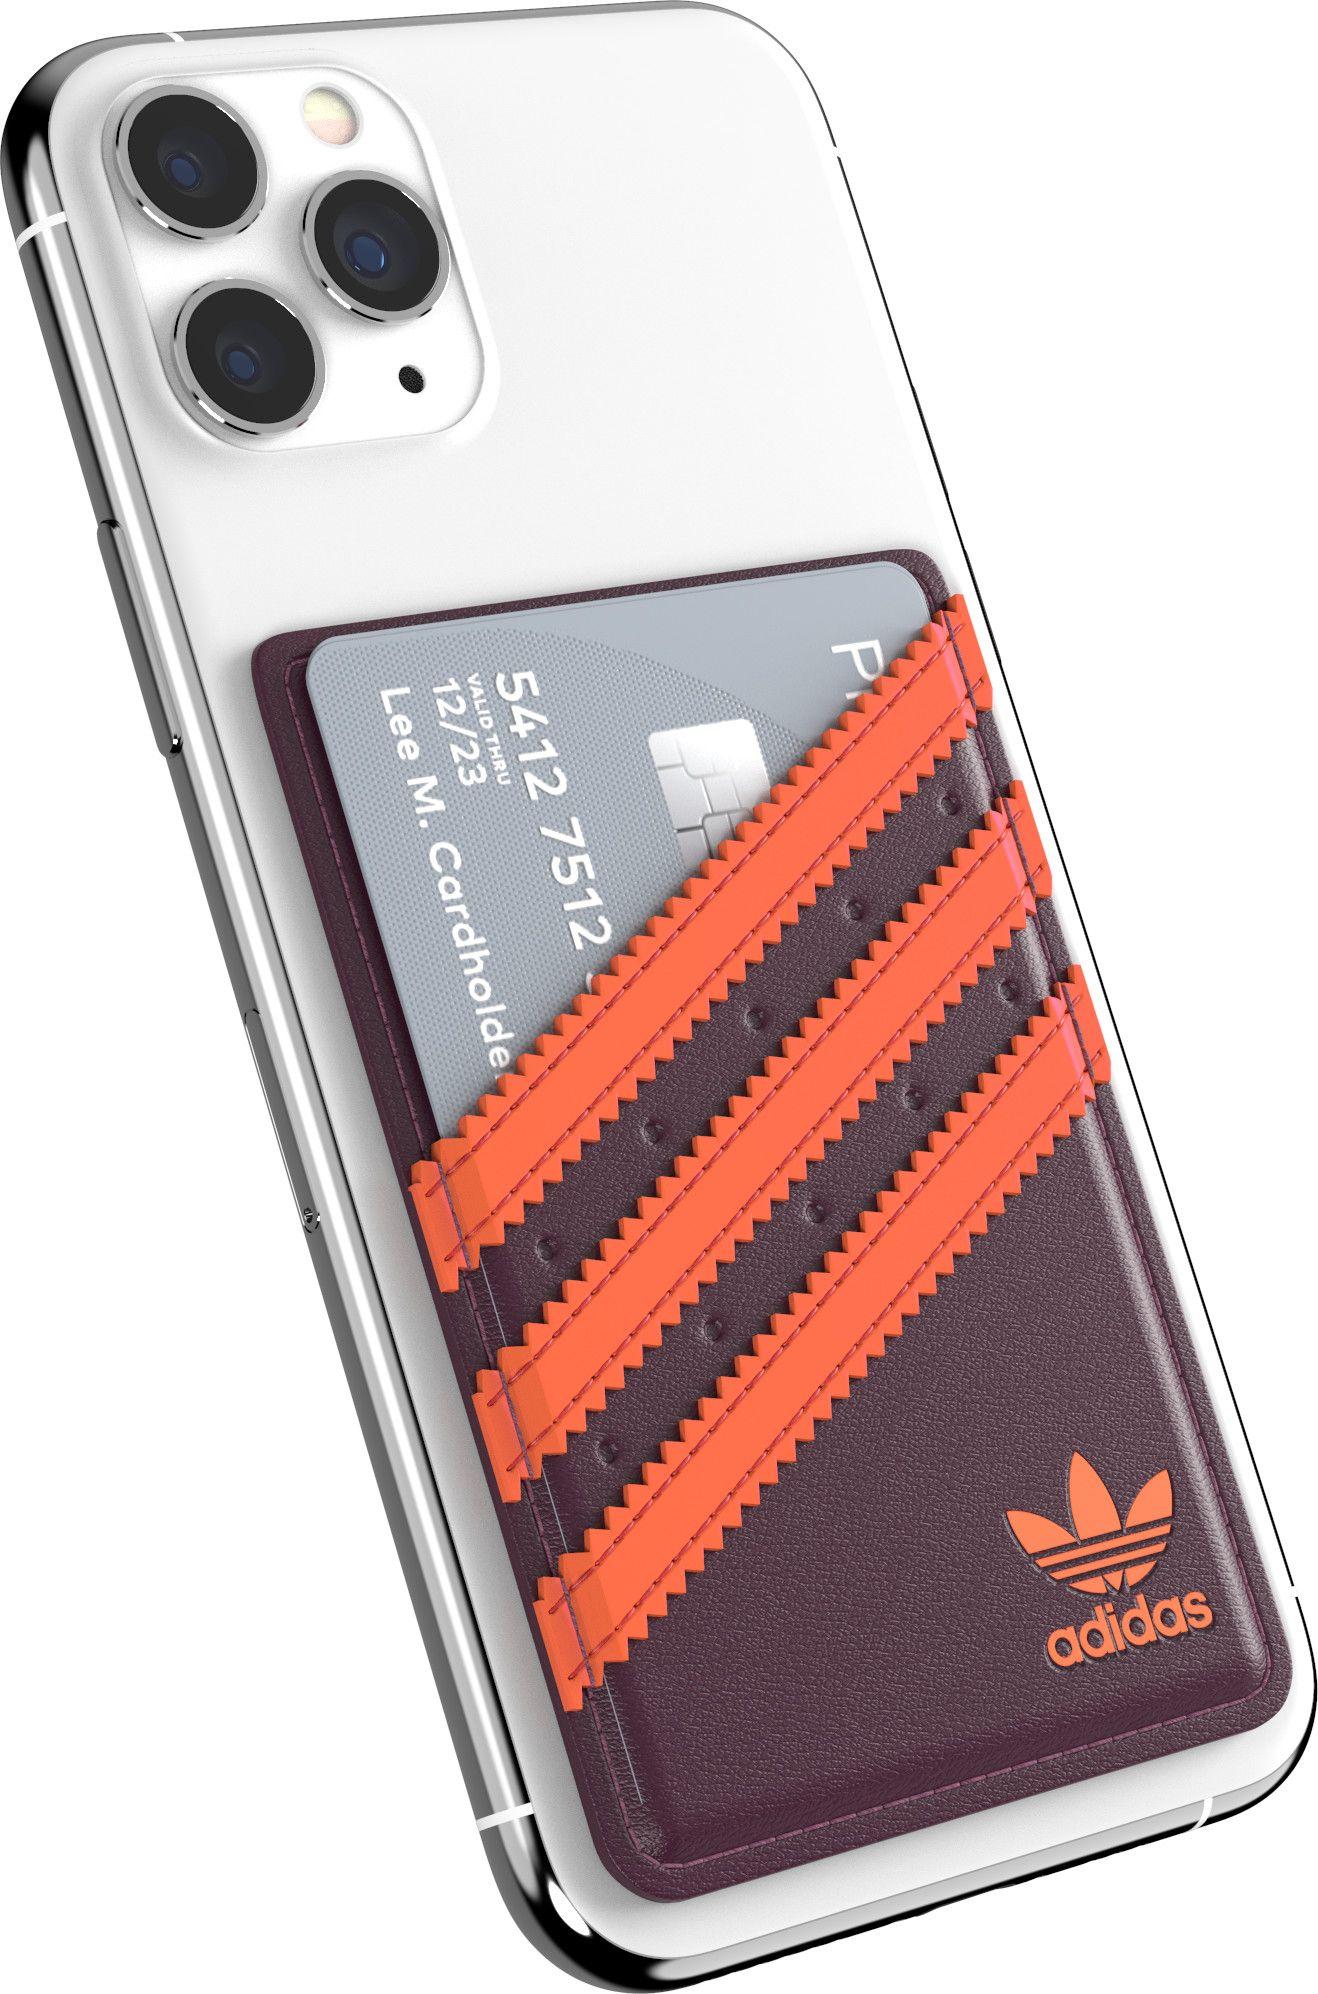 Adidas OR Universal Pocket